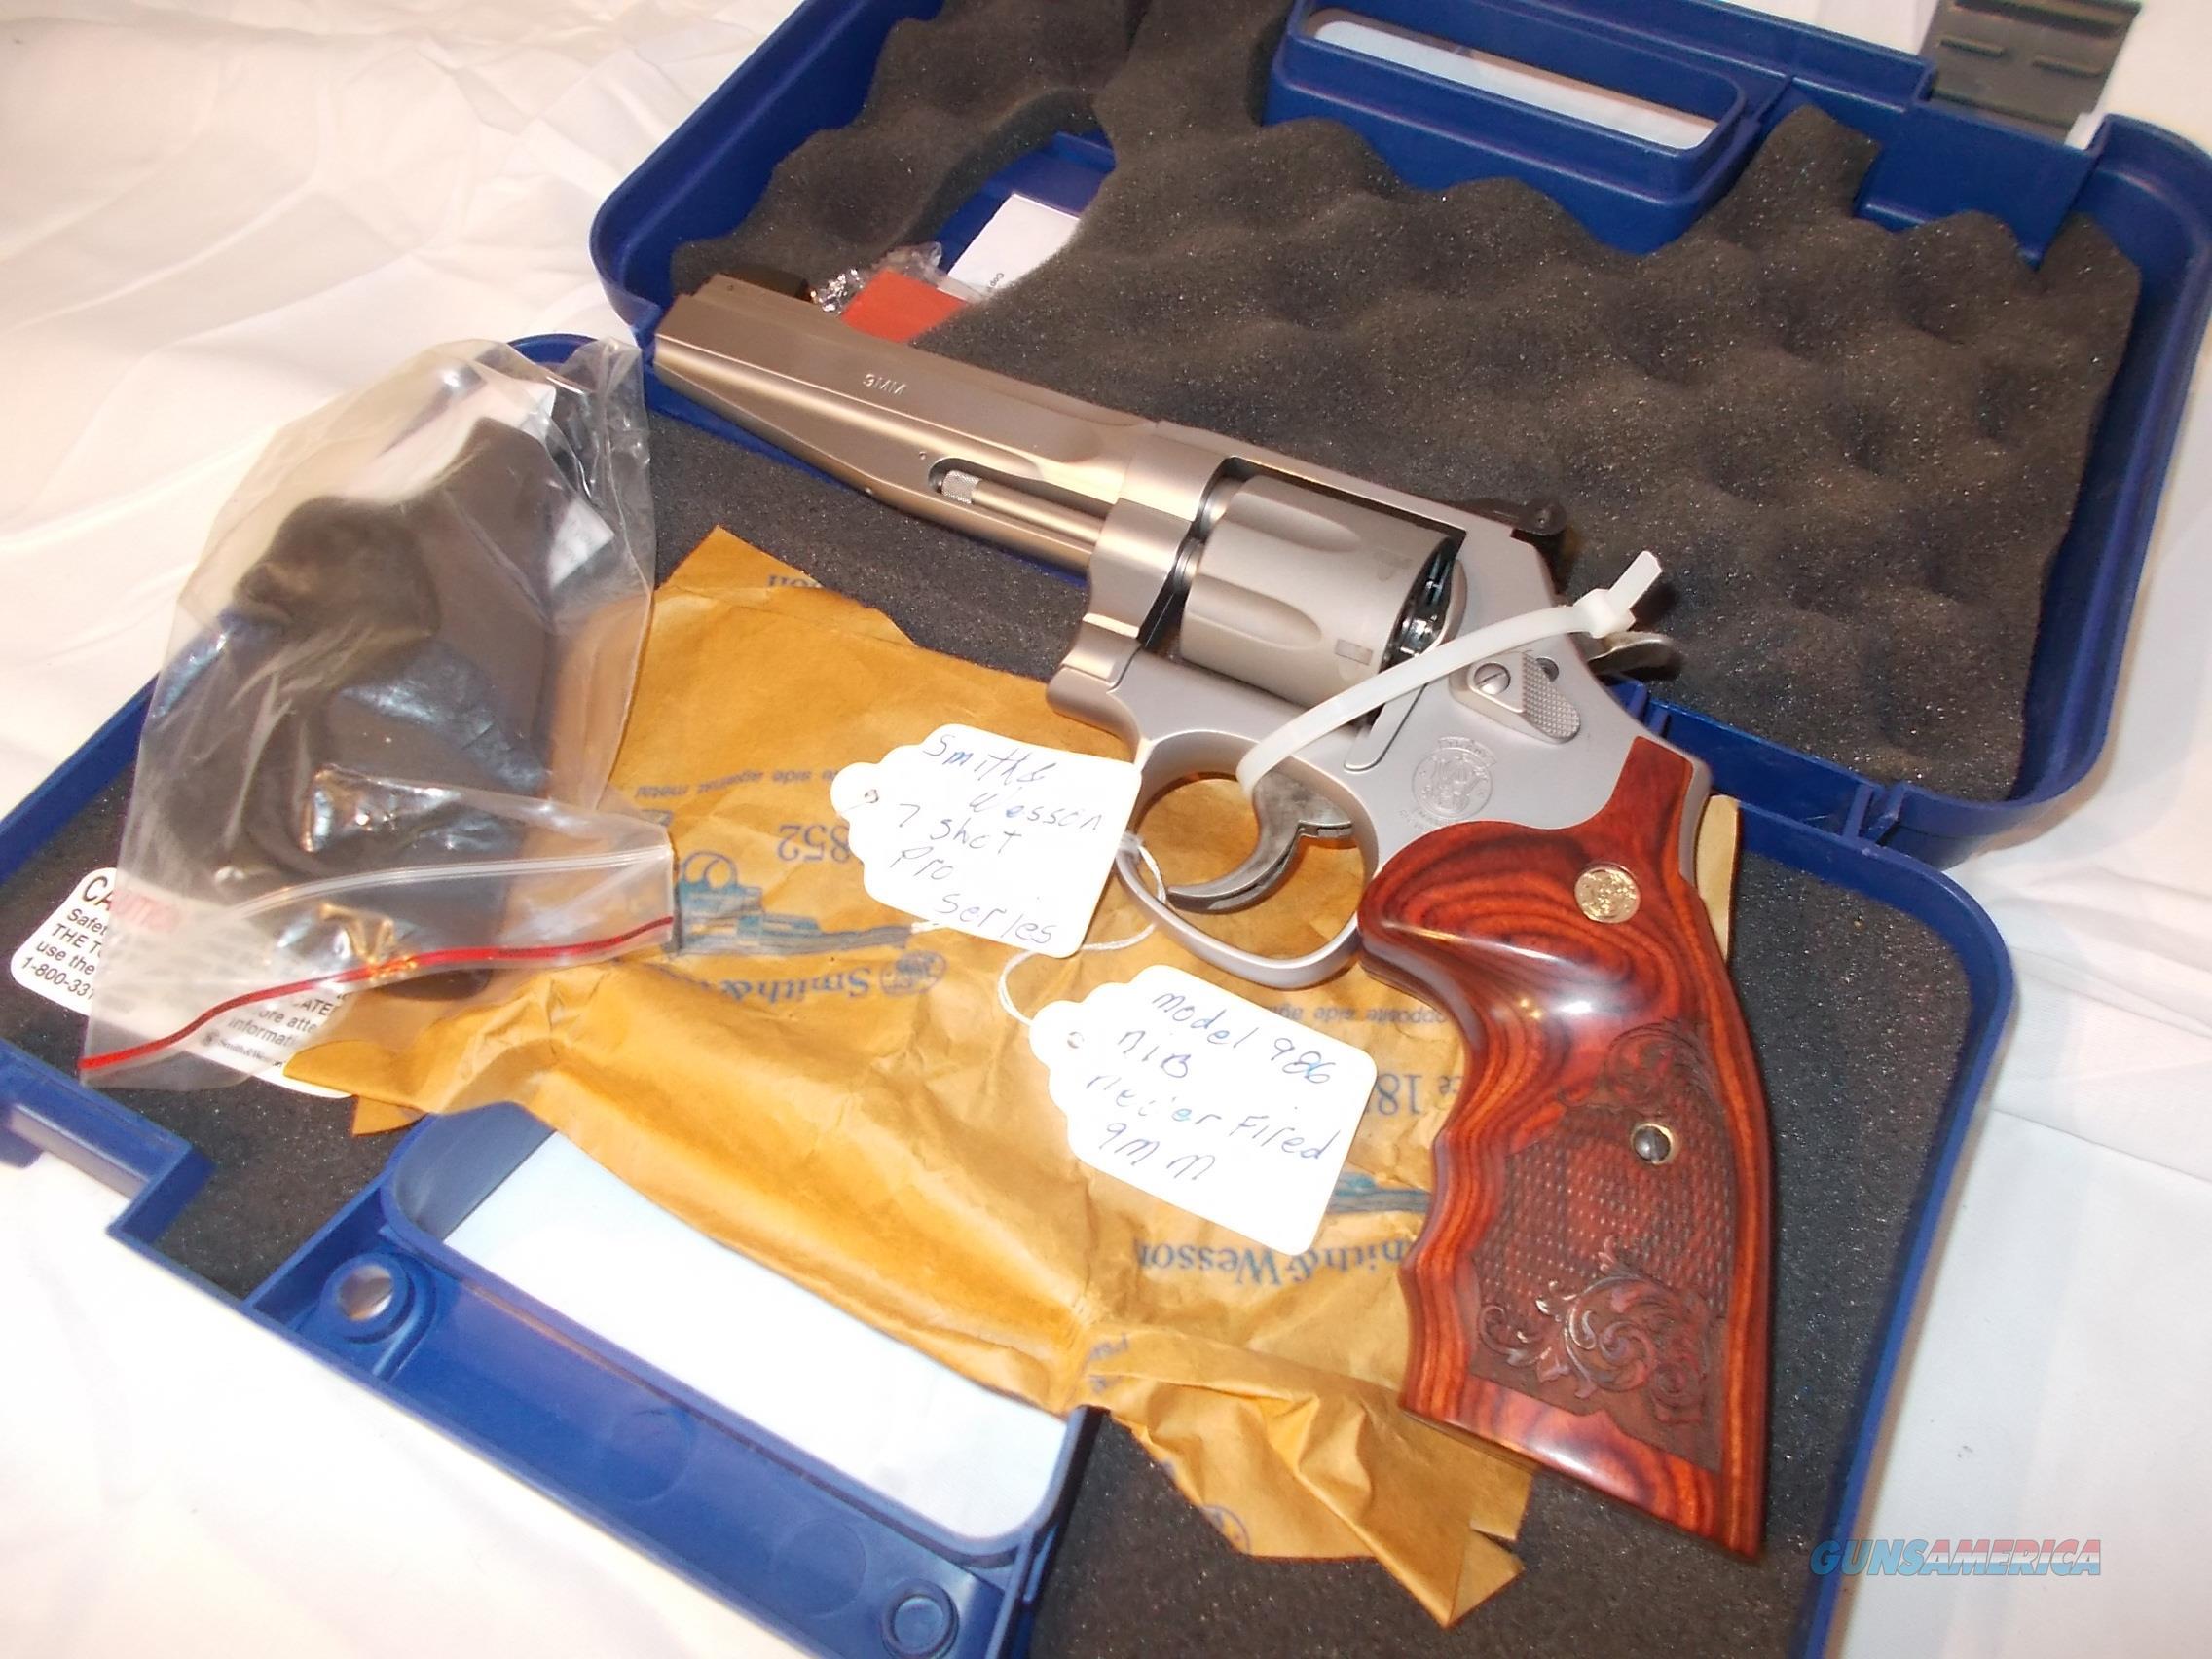 smith&wesson 986 9mm pro series  Guns > Pistols > Smith & Wesson Revolvers > Full Frame Revolver